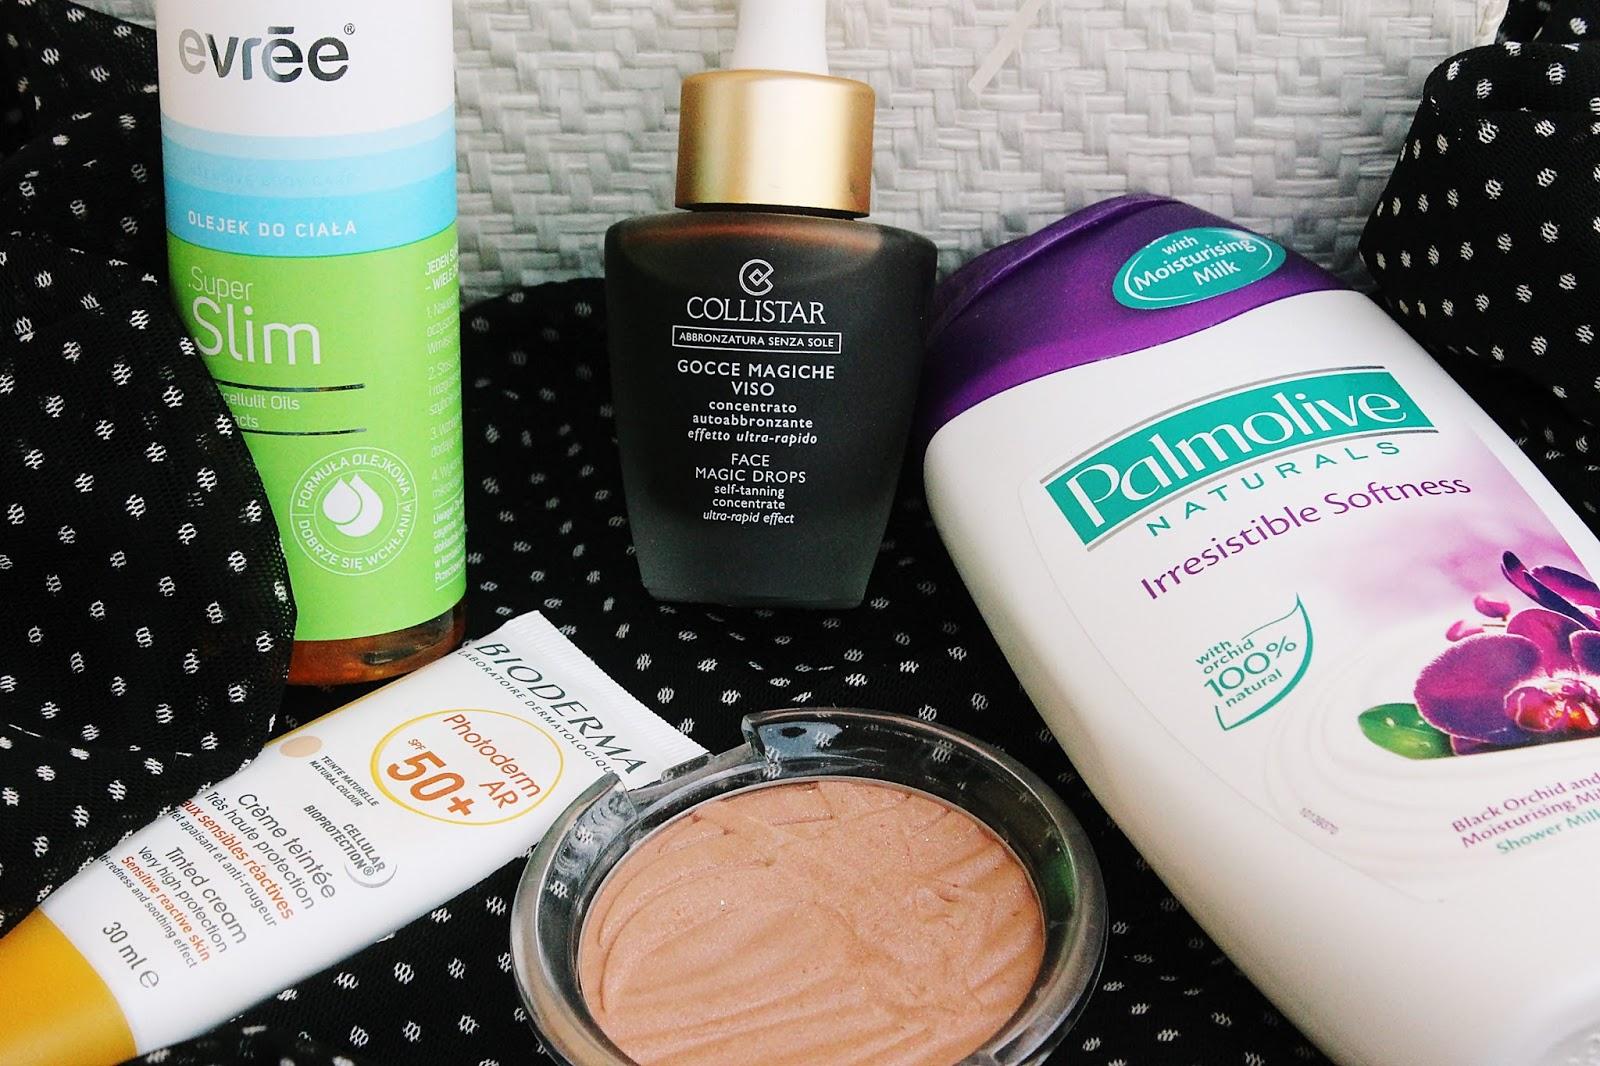 Hity kosmetyczne lipca | Bioderma, Collistar, Evree, Essence, Palmolive